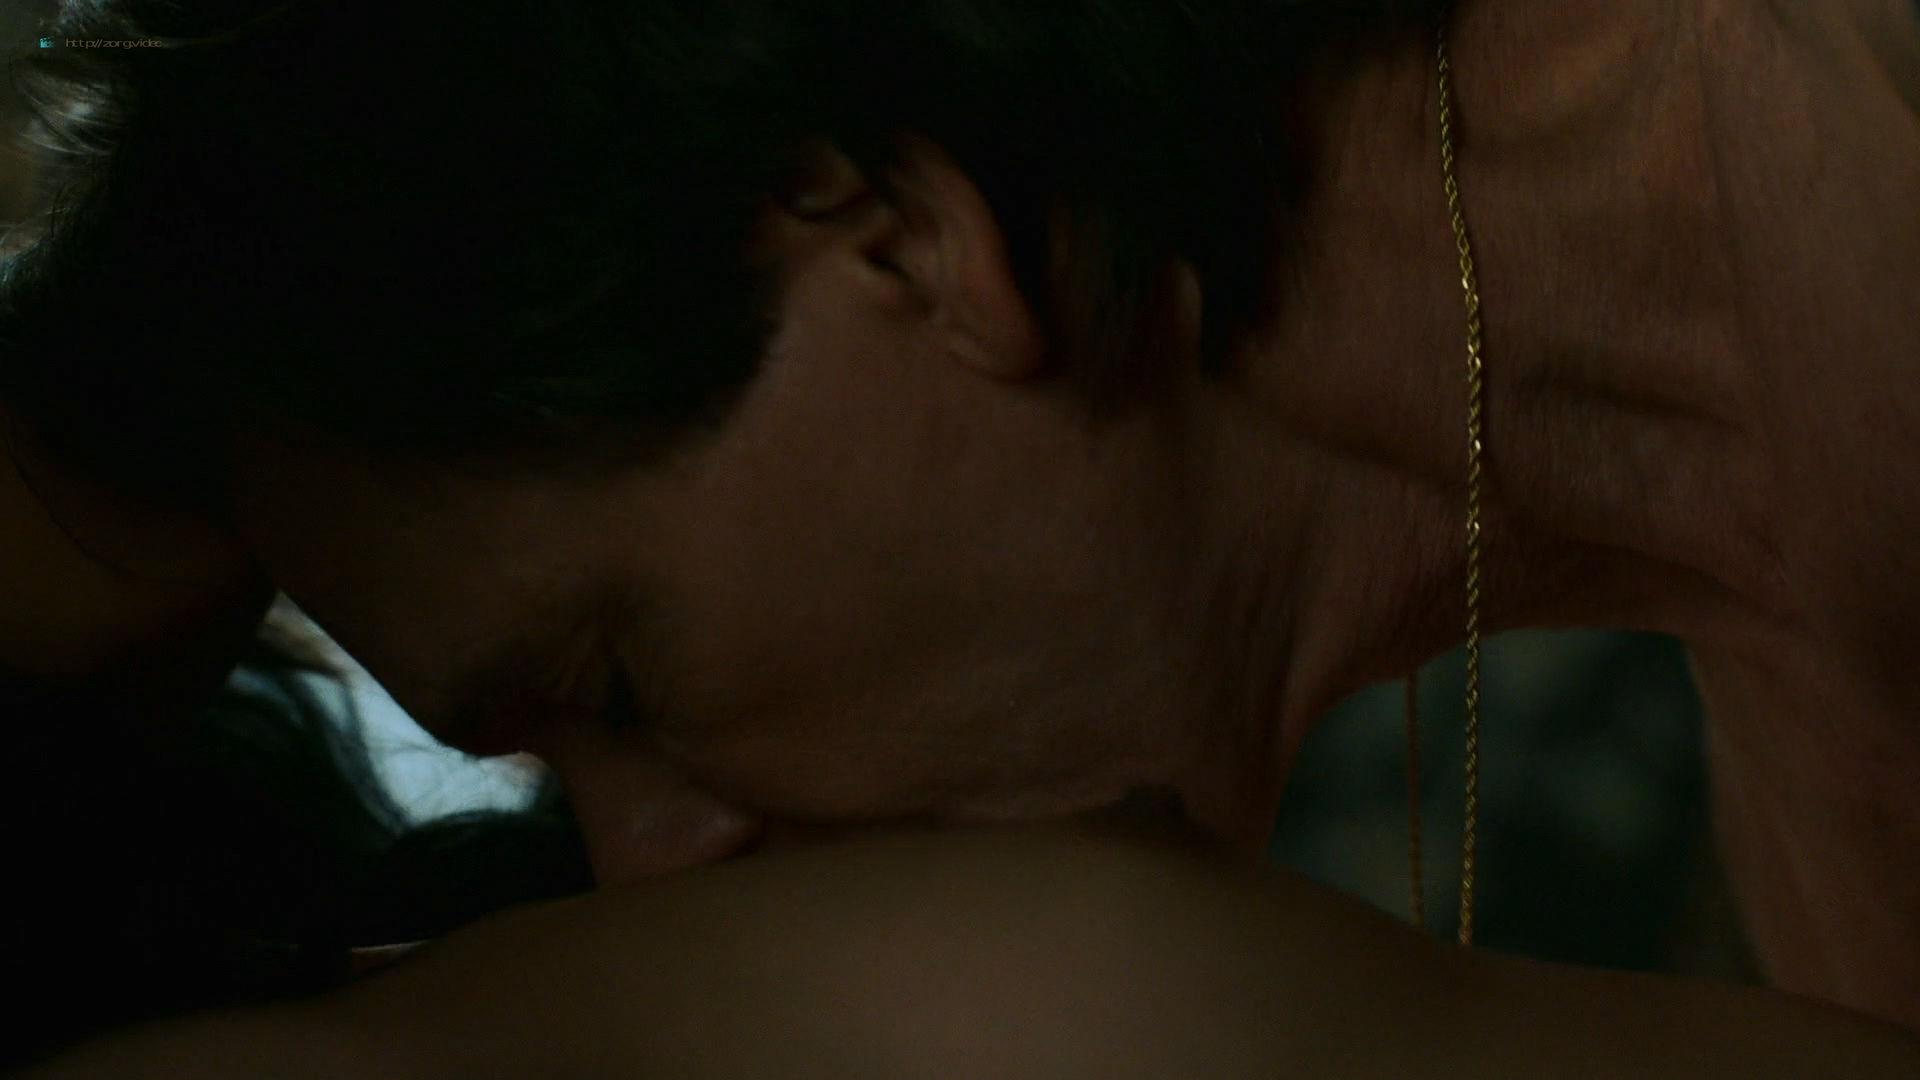 MaYaa Boateng nude topless in sex scene - City on a Hill (2019) s1e2 HD 1080p (2)